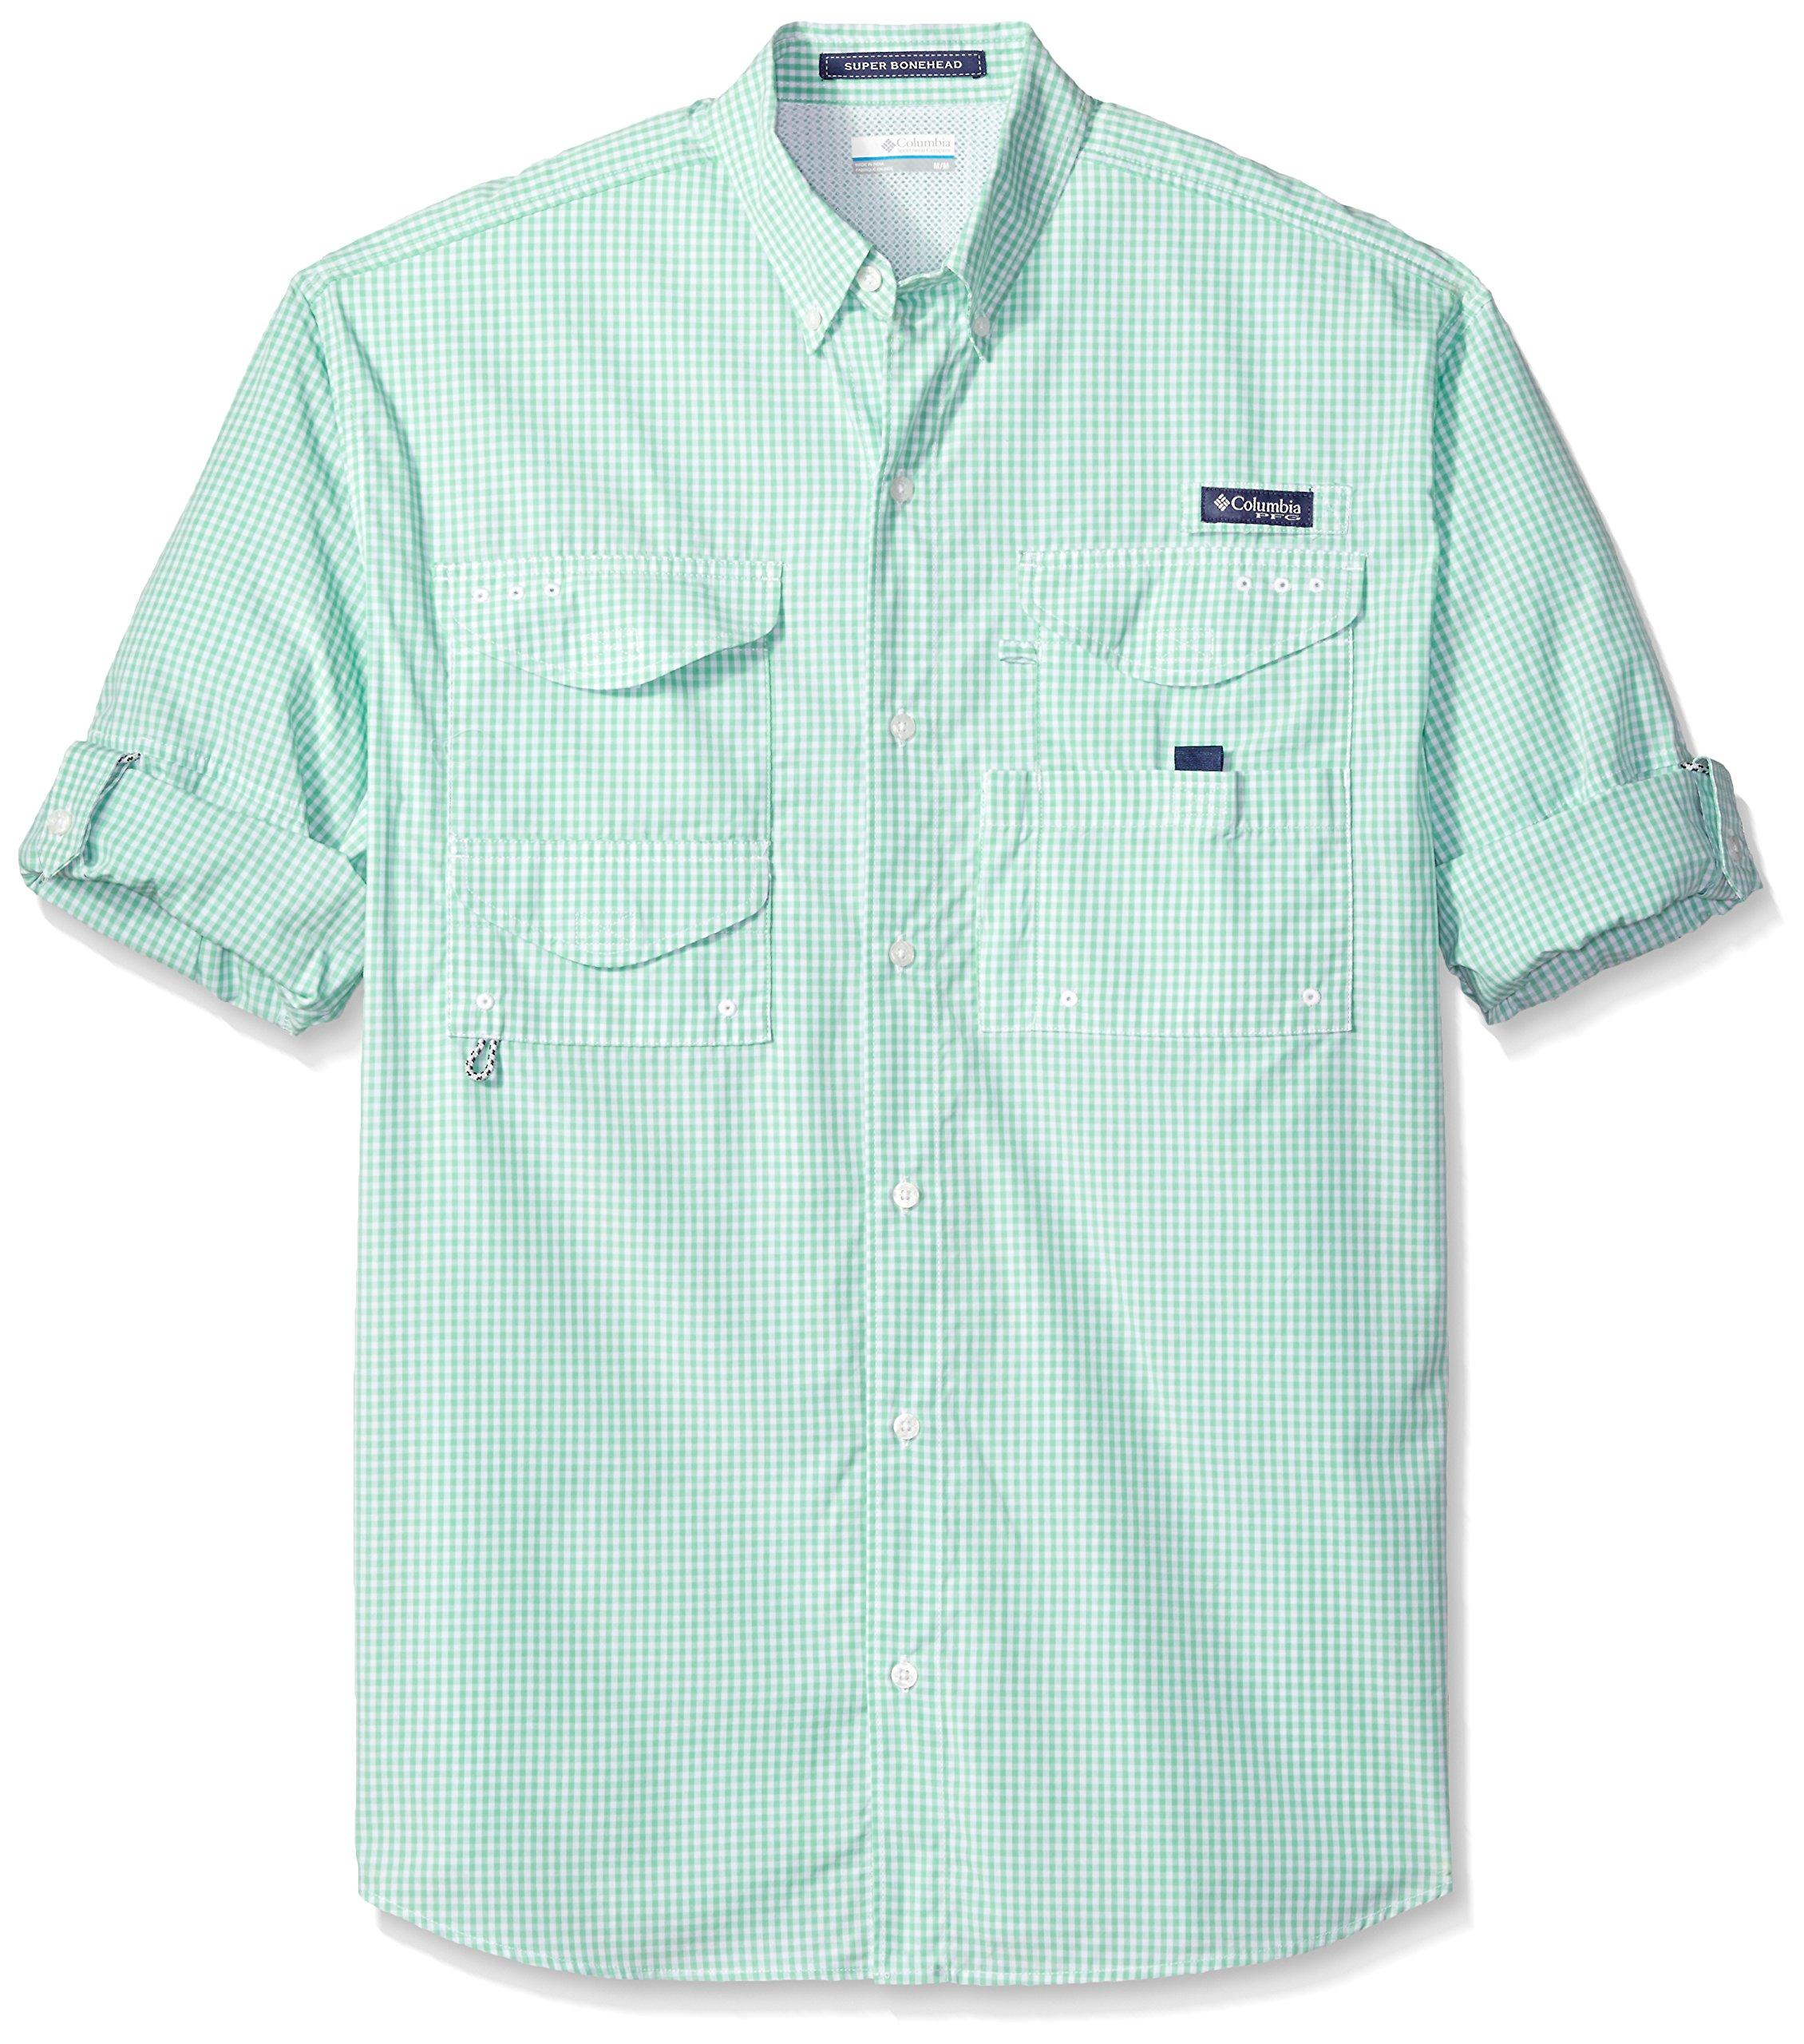 Columbia Men's Super Bonehead Classic Long Sleeve Shirt, Kelp Gingham, XX-Large by Columbia